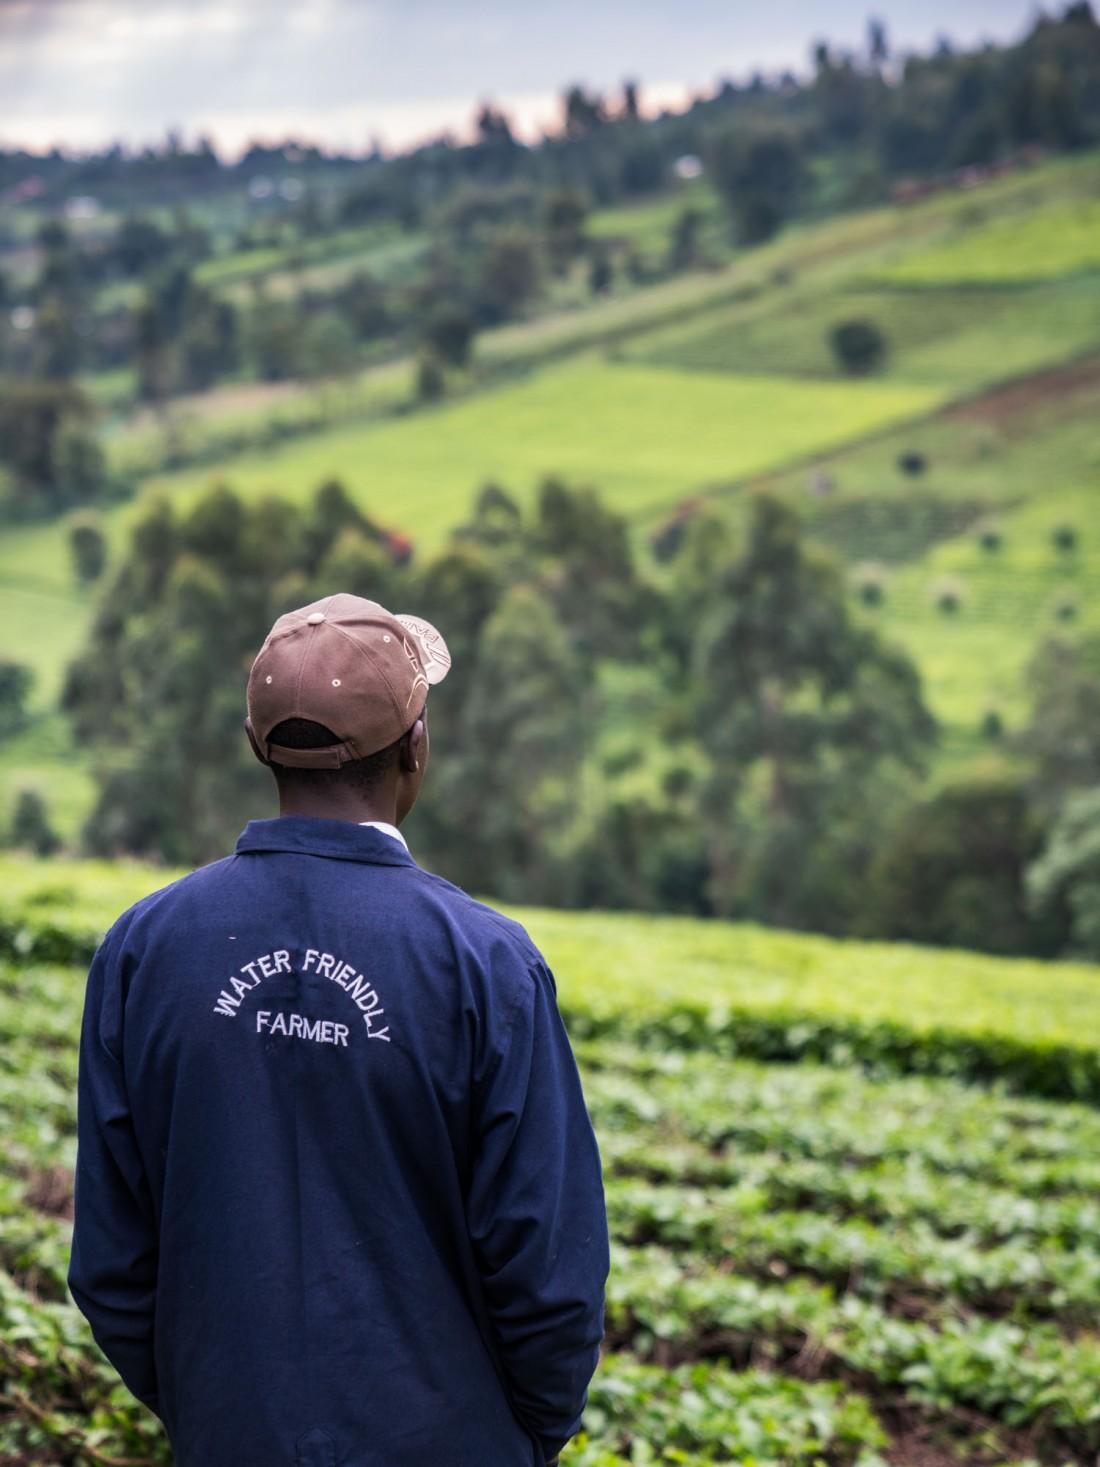 water friendly farmer ngo photographer kenya africa